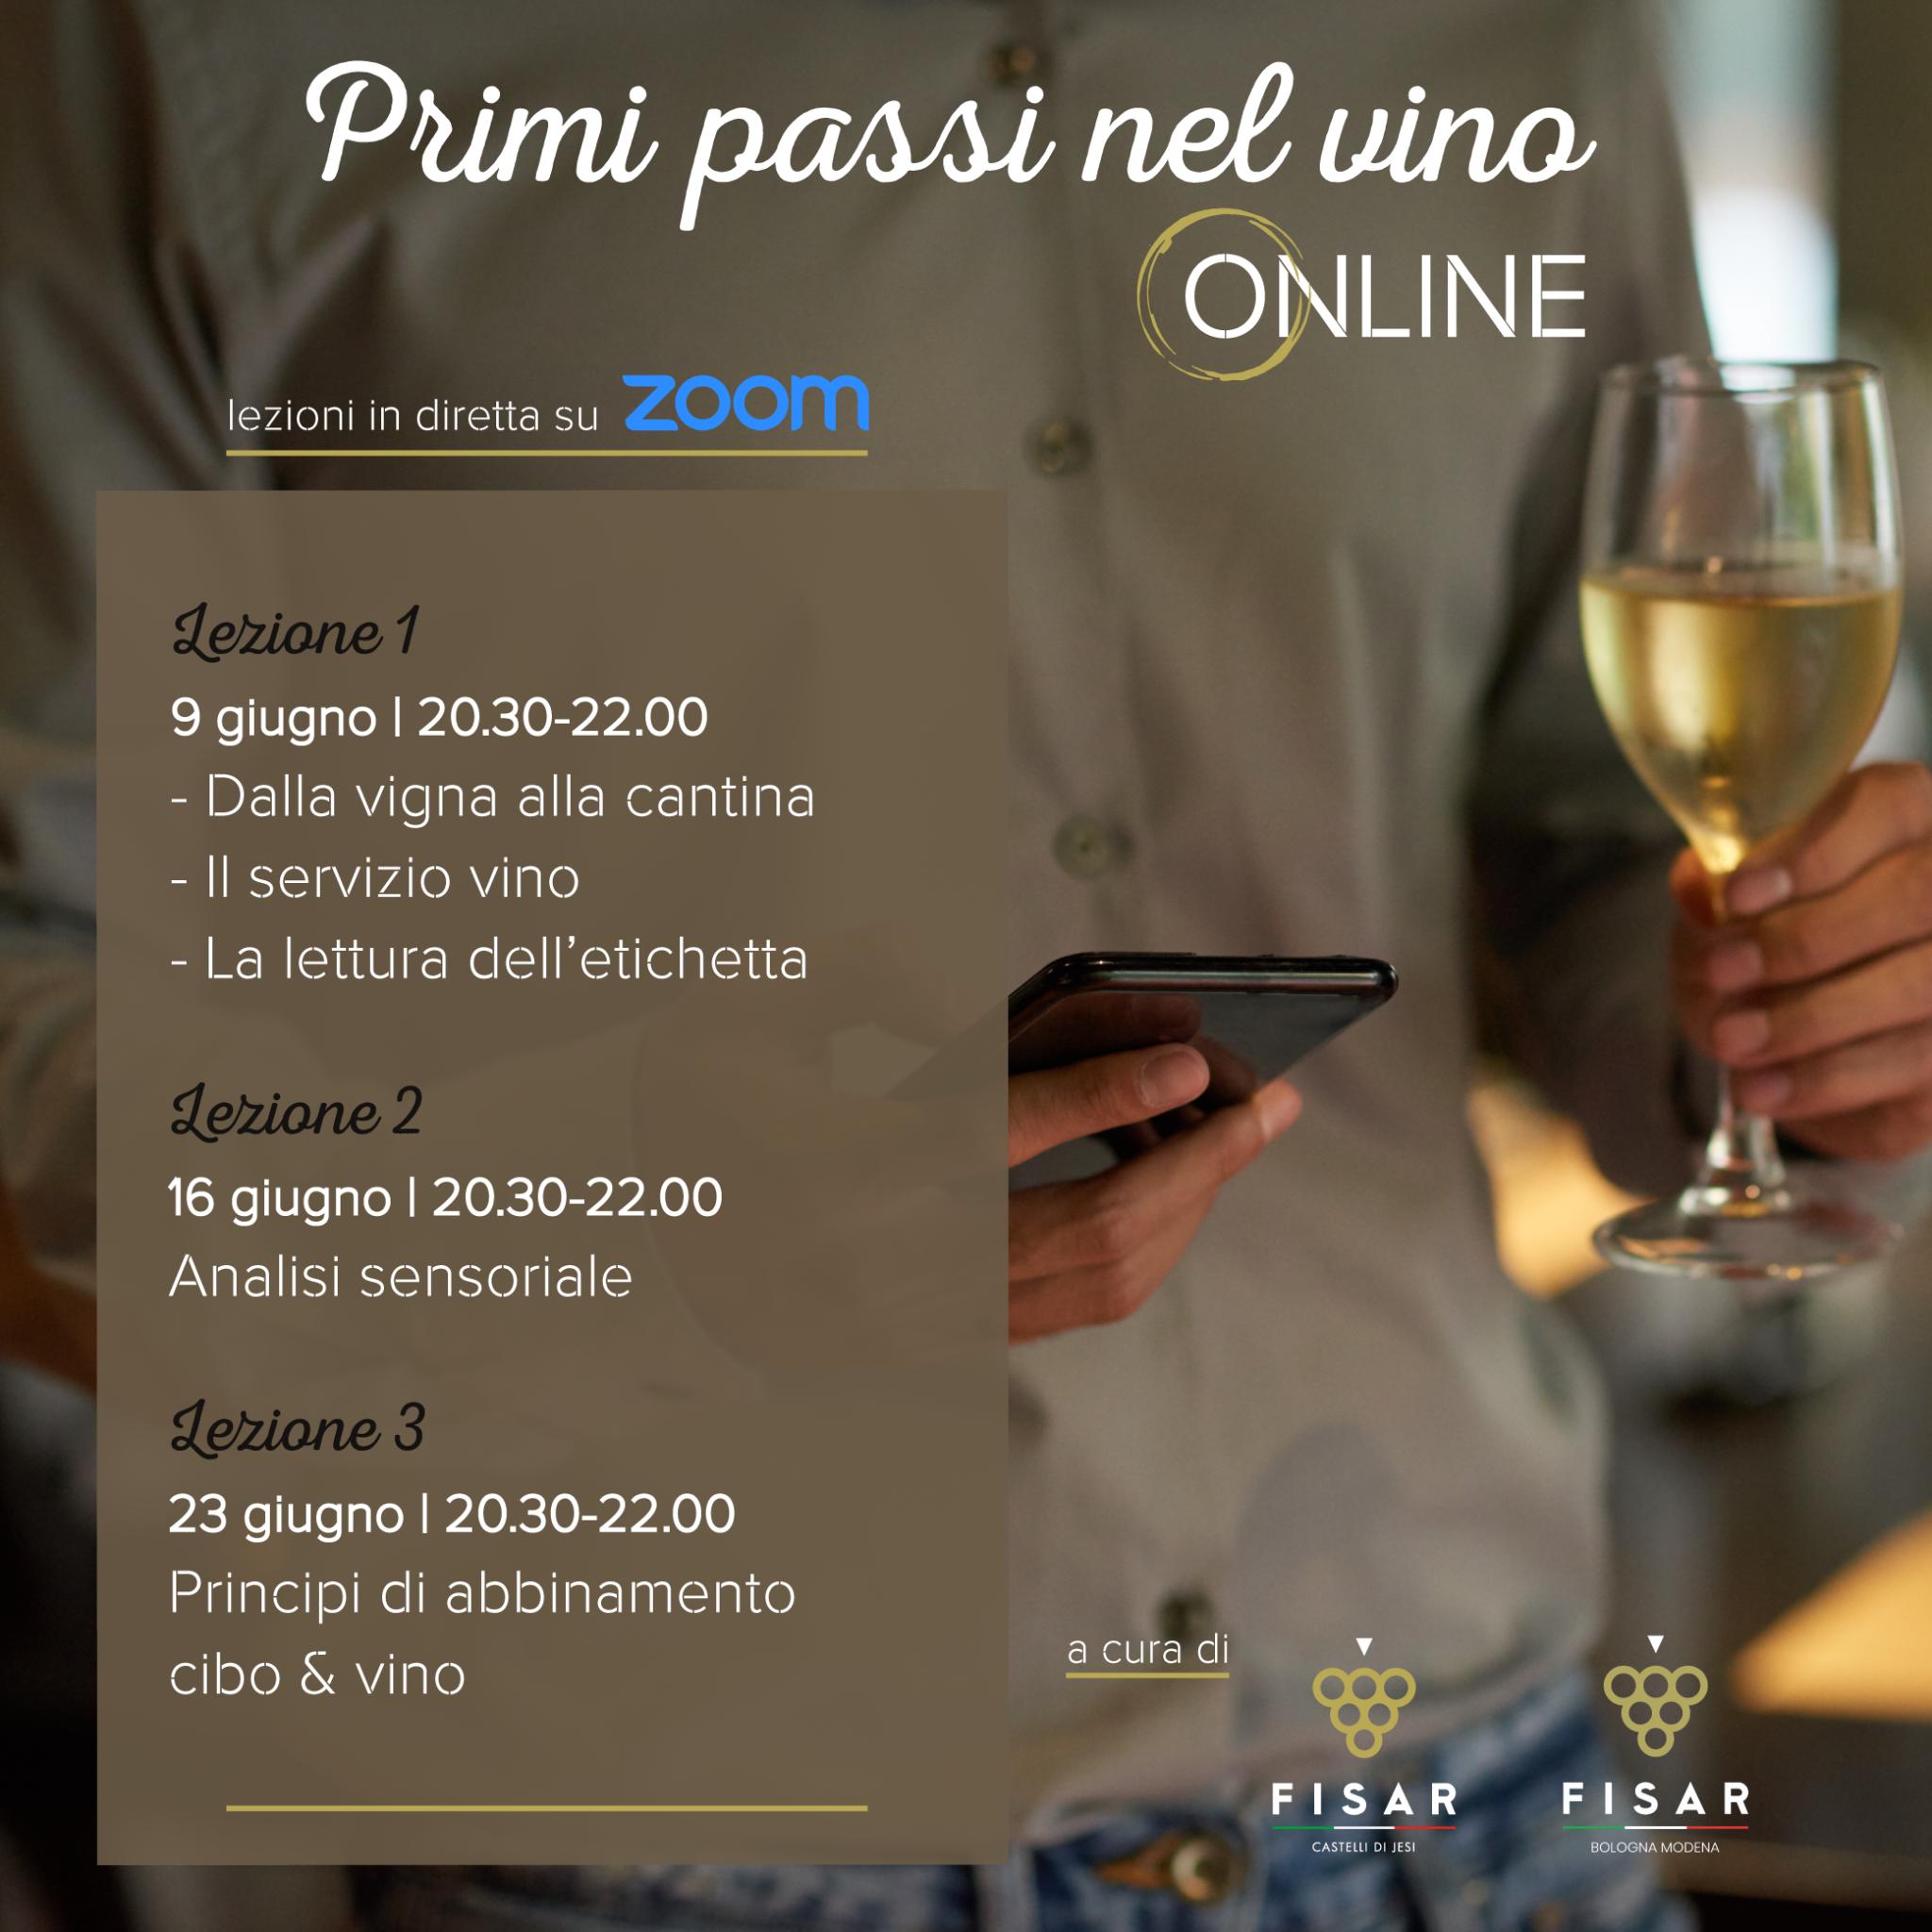 Primi passi nel vino… online